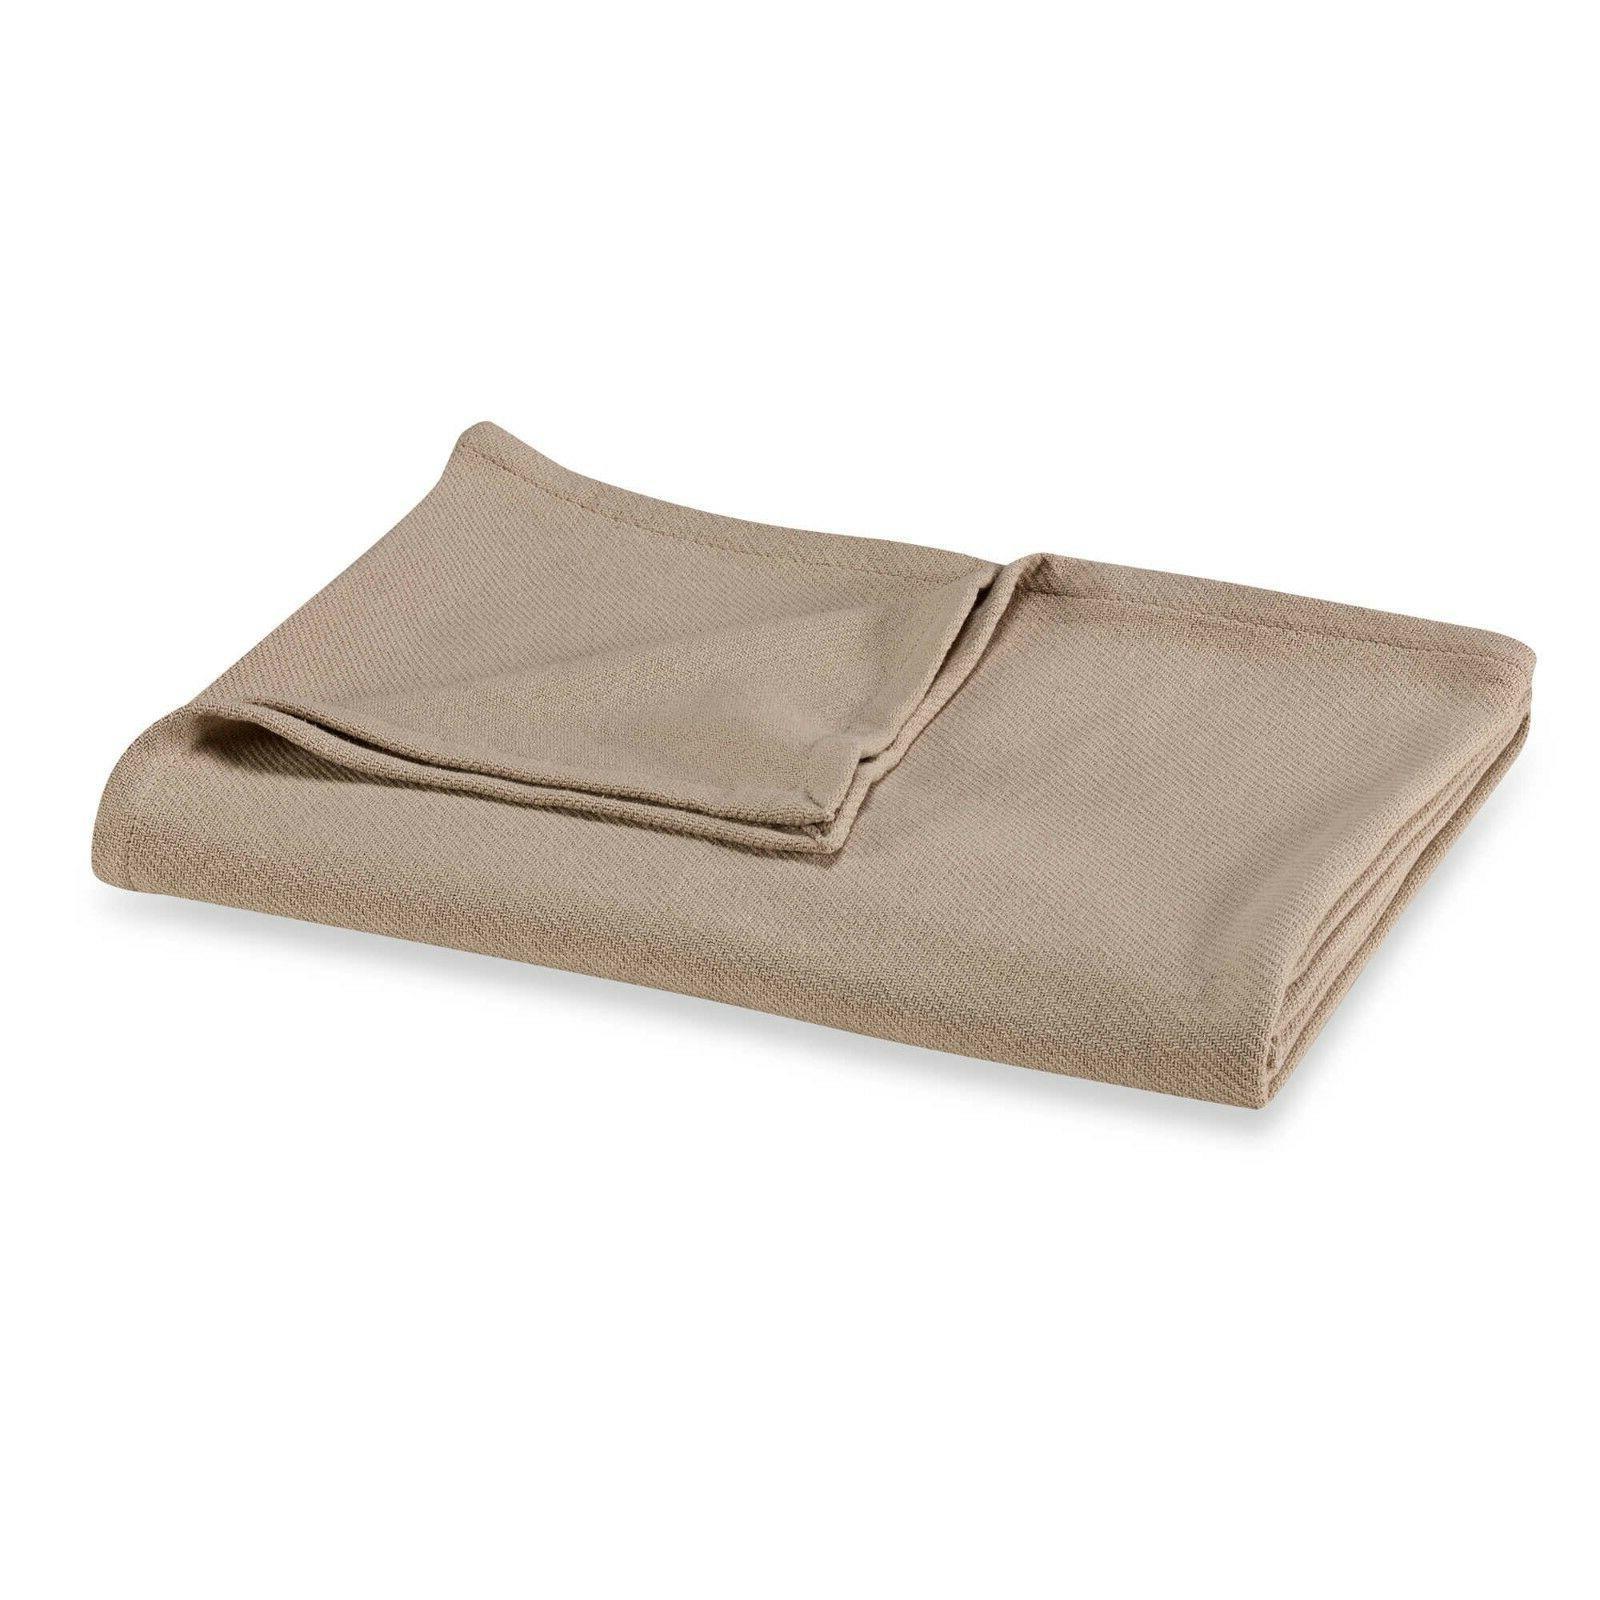 Homvare All Season Twin Super Soft Cotton Solid Twil Weave B